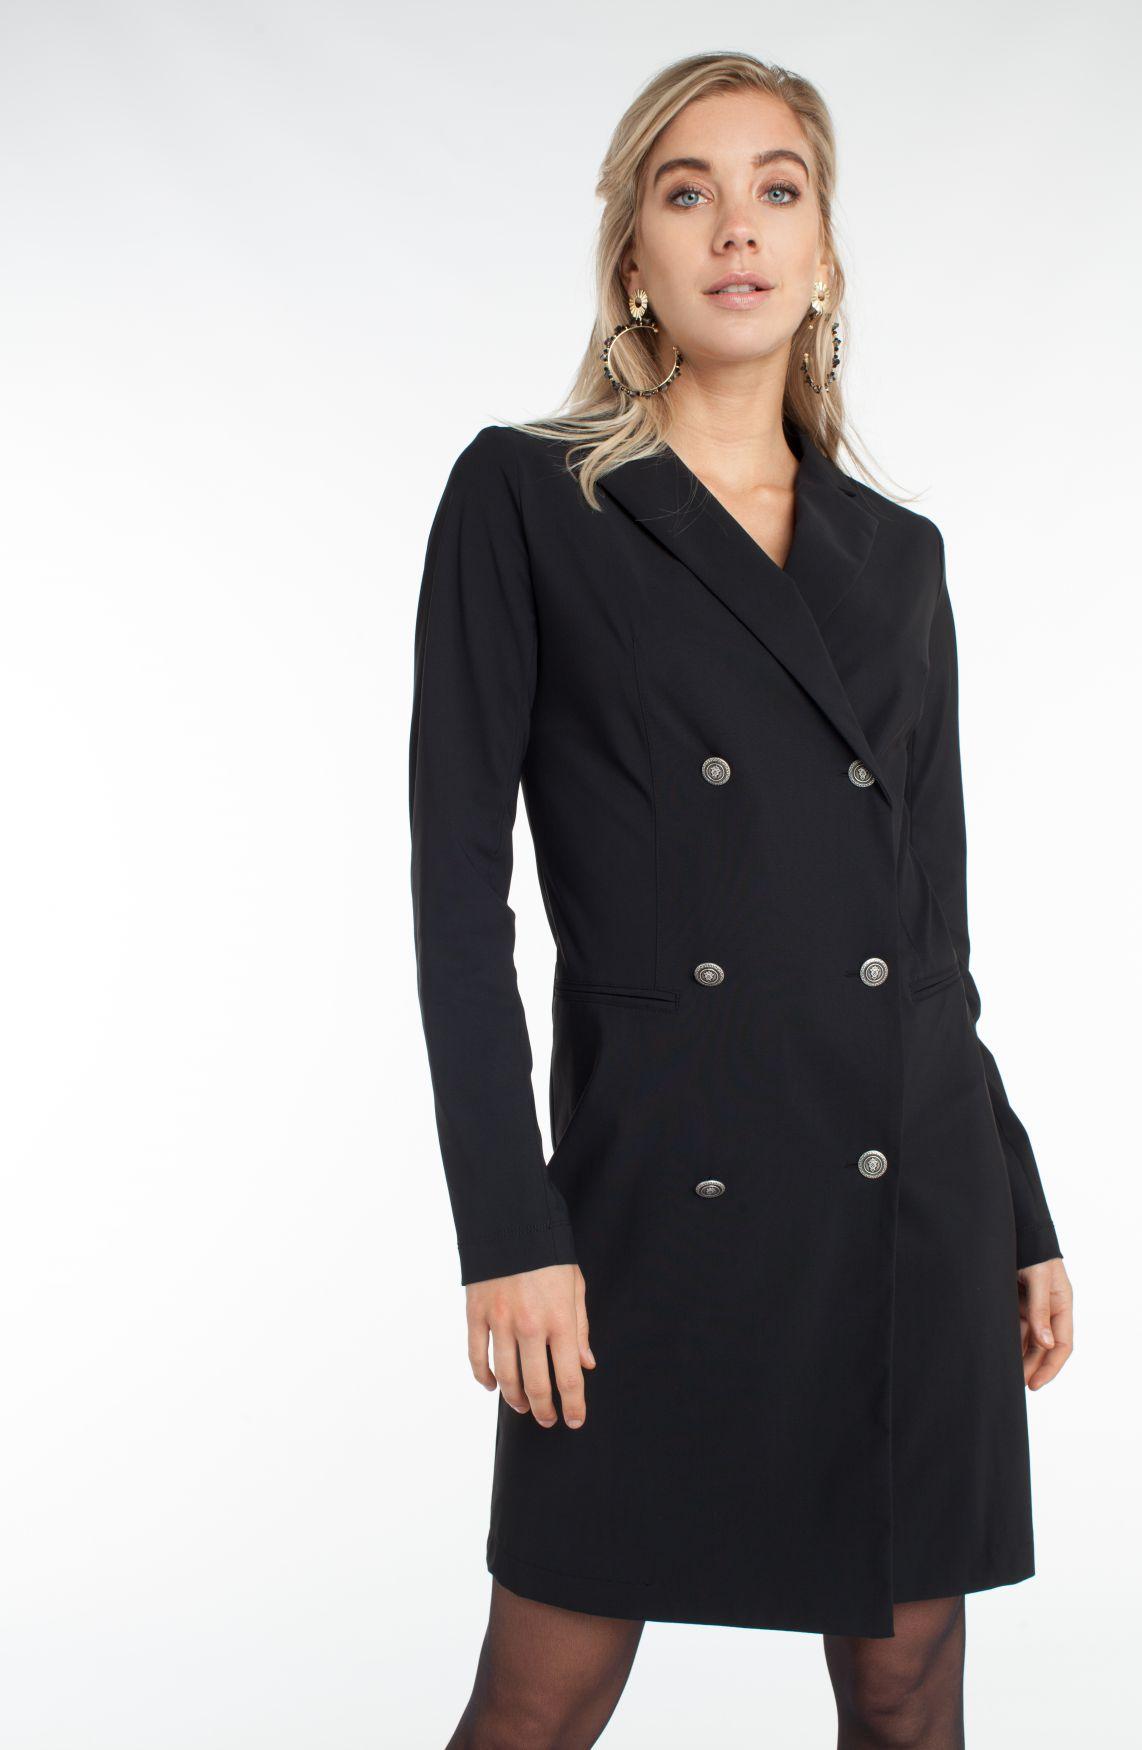 Jane Lushka Dames Double breasted blazerjurk zwart